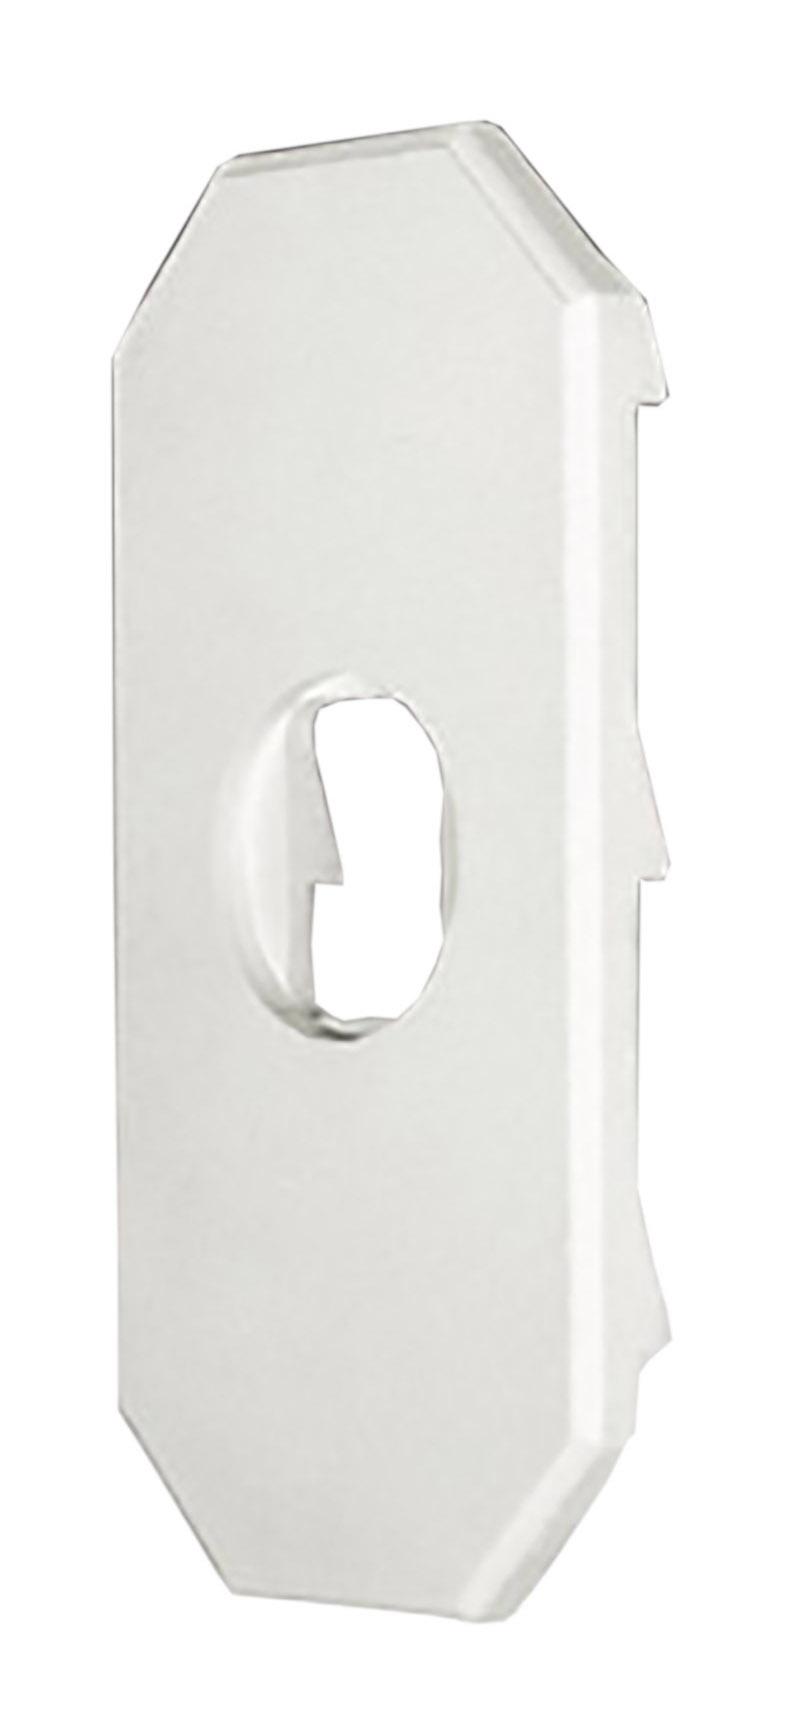 Buy 8063lb Siding Light Blocks 5 Quot Lap Siding Light